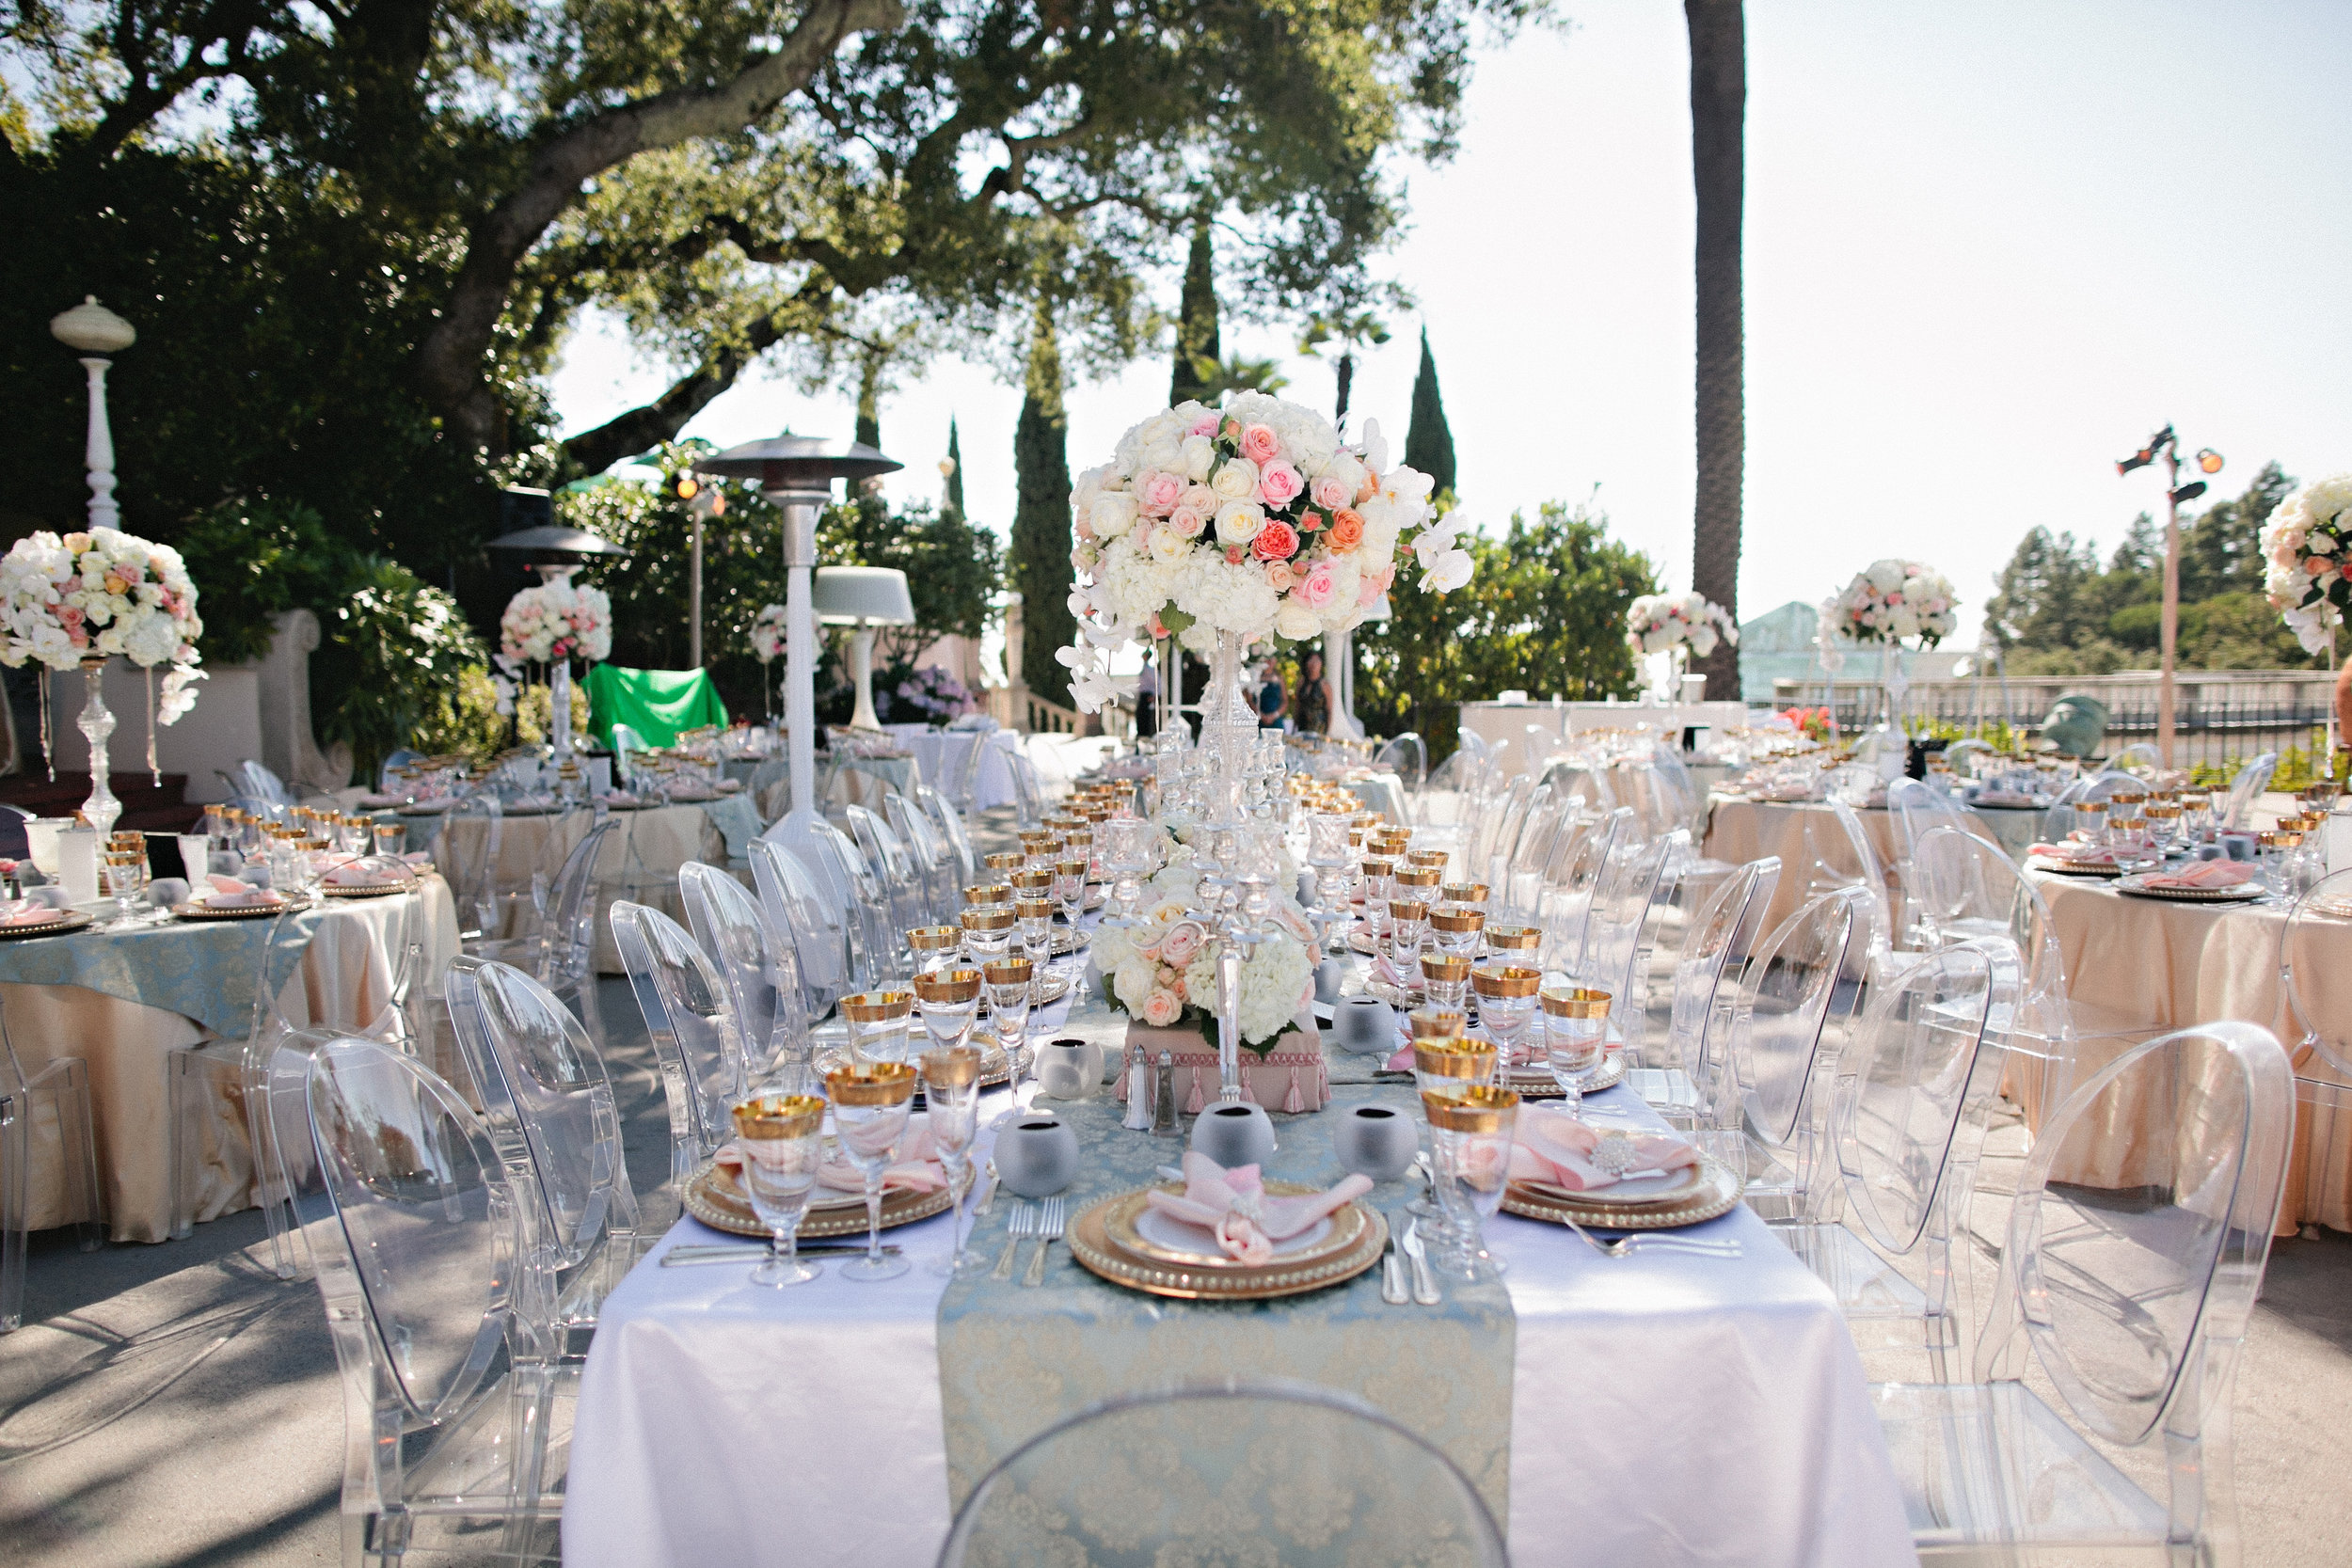 9112_linda_vu_wedding-1616984359-O.jpg